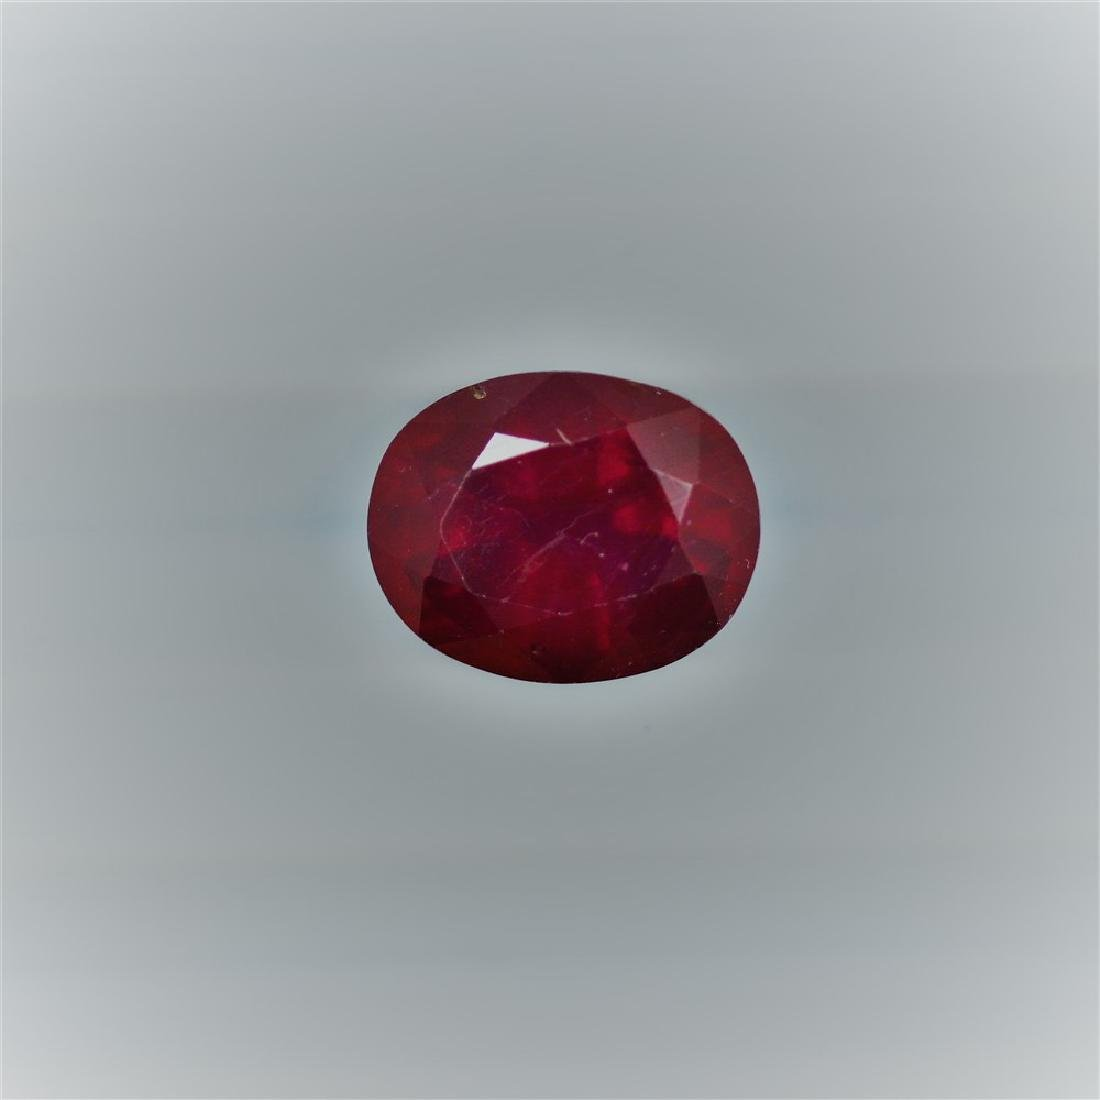 4.22 Carat Loose Ruby Oval cut